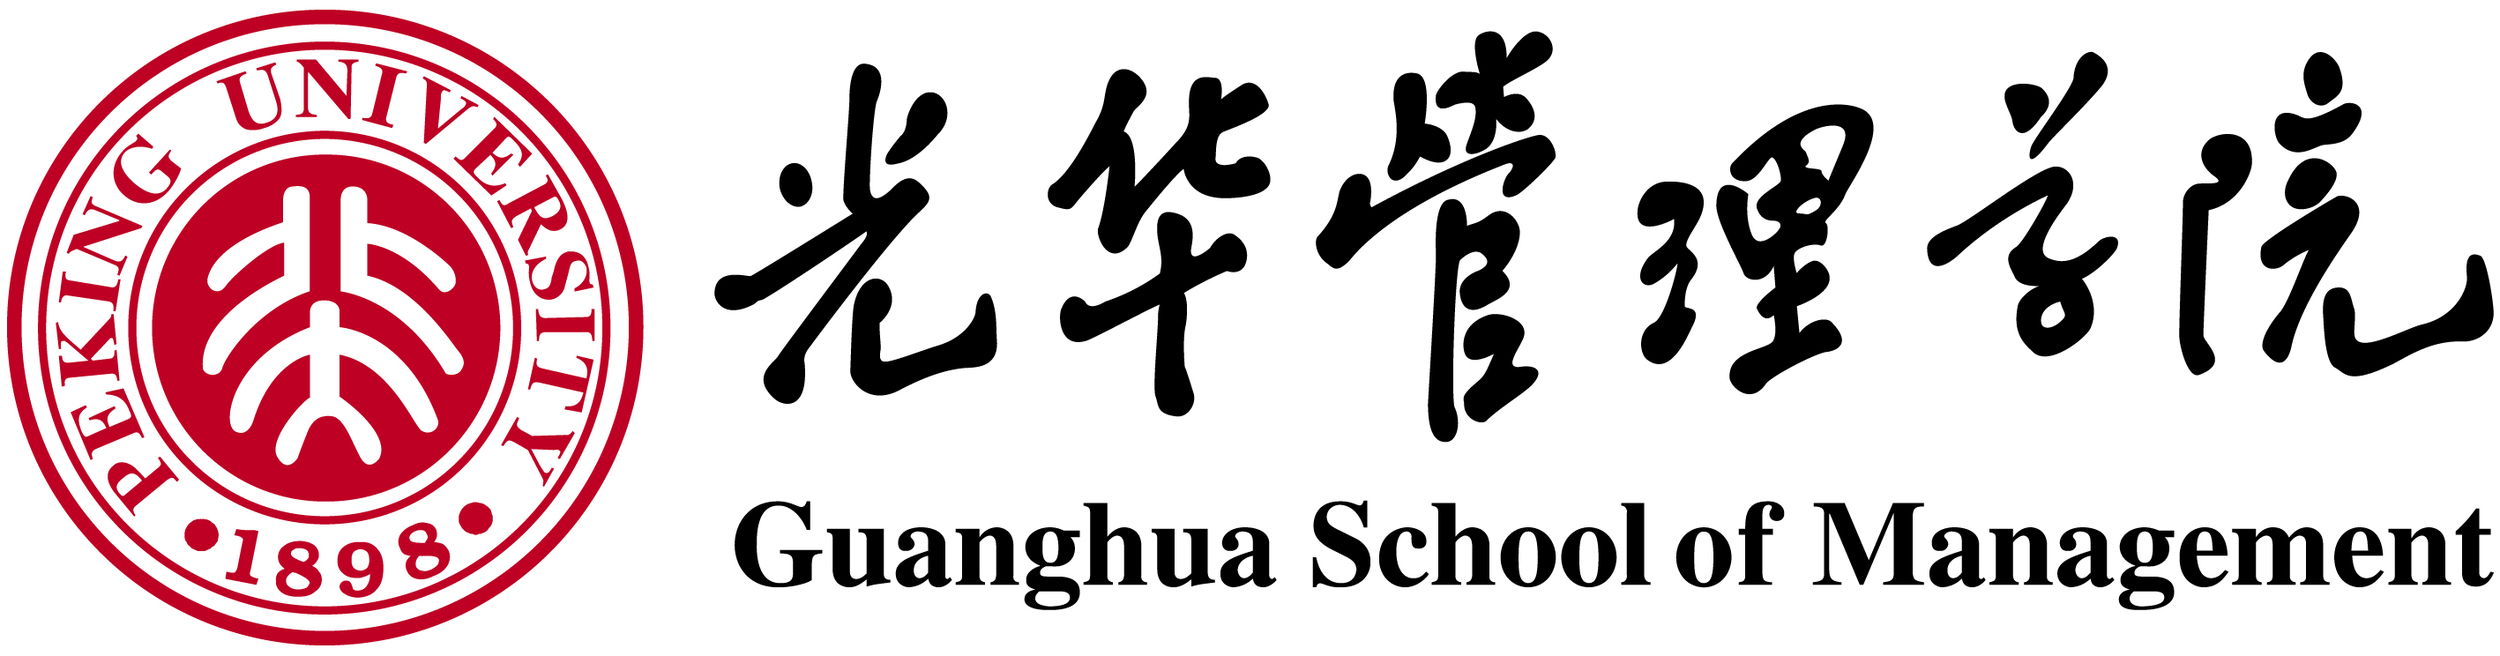 Guanghua logo_20111220122052.JPG